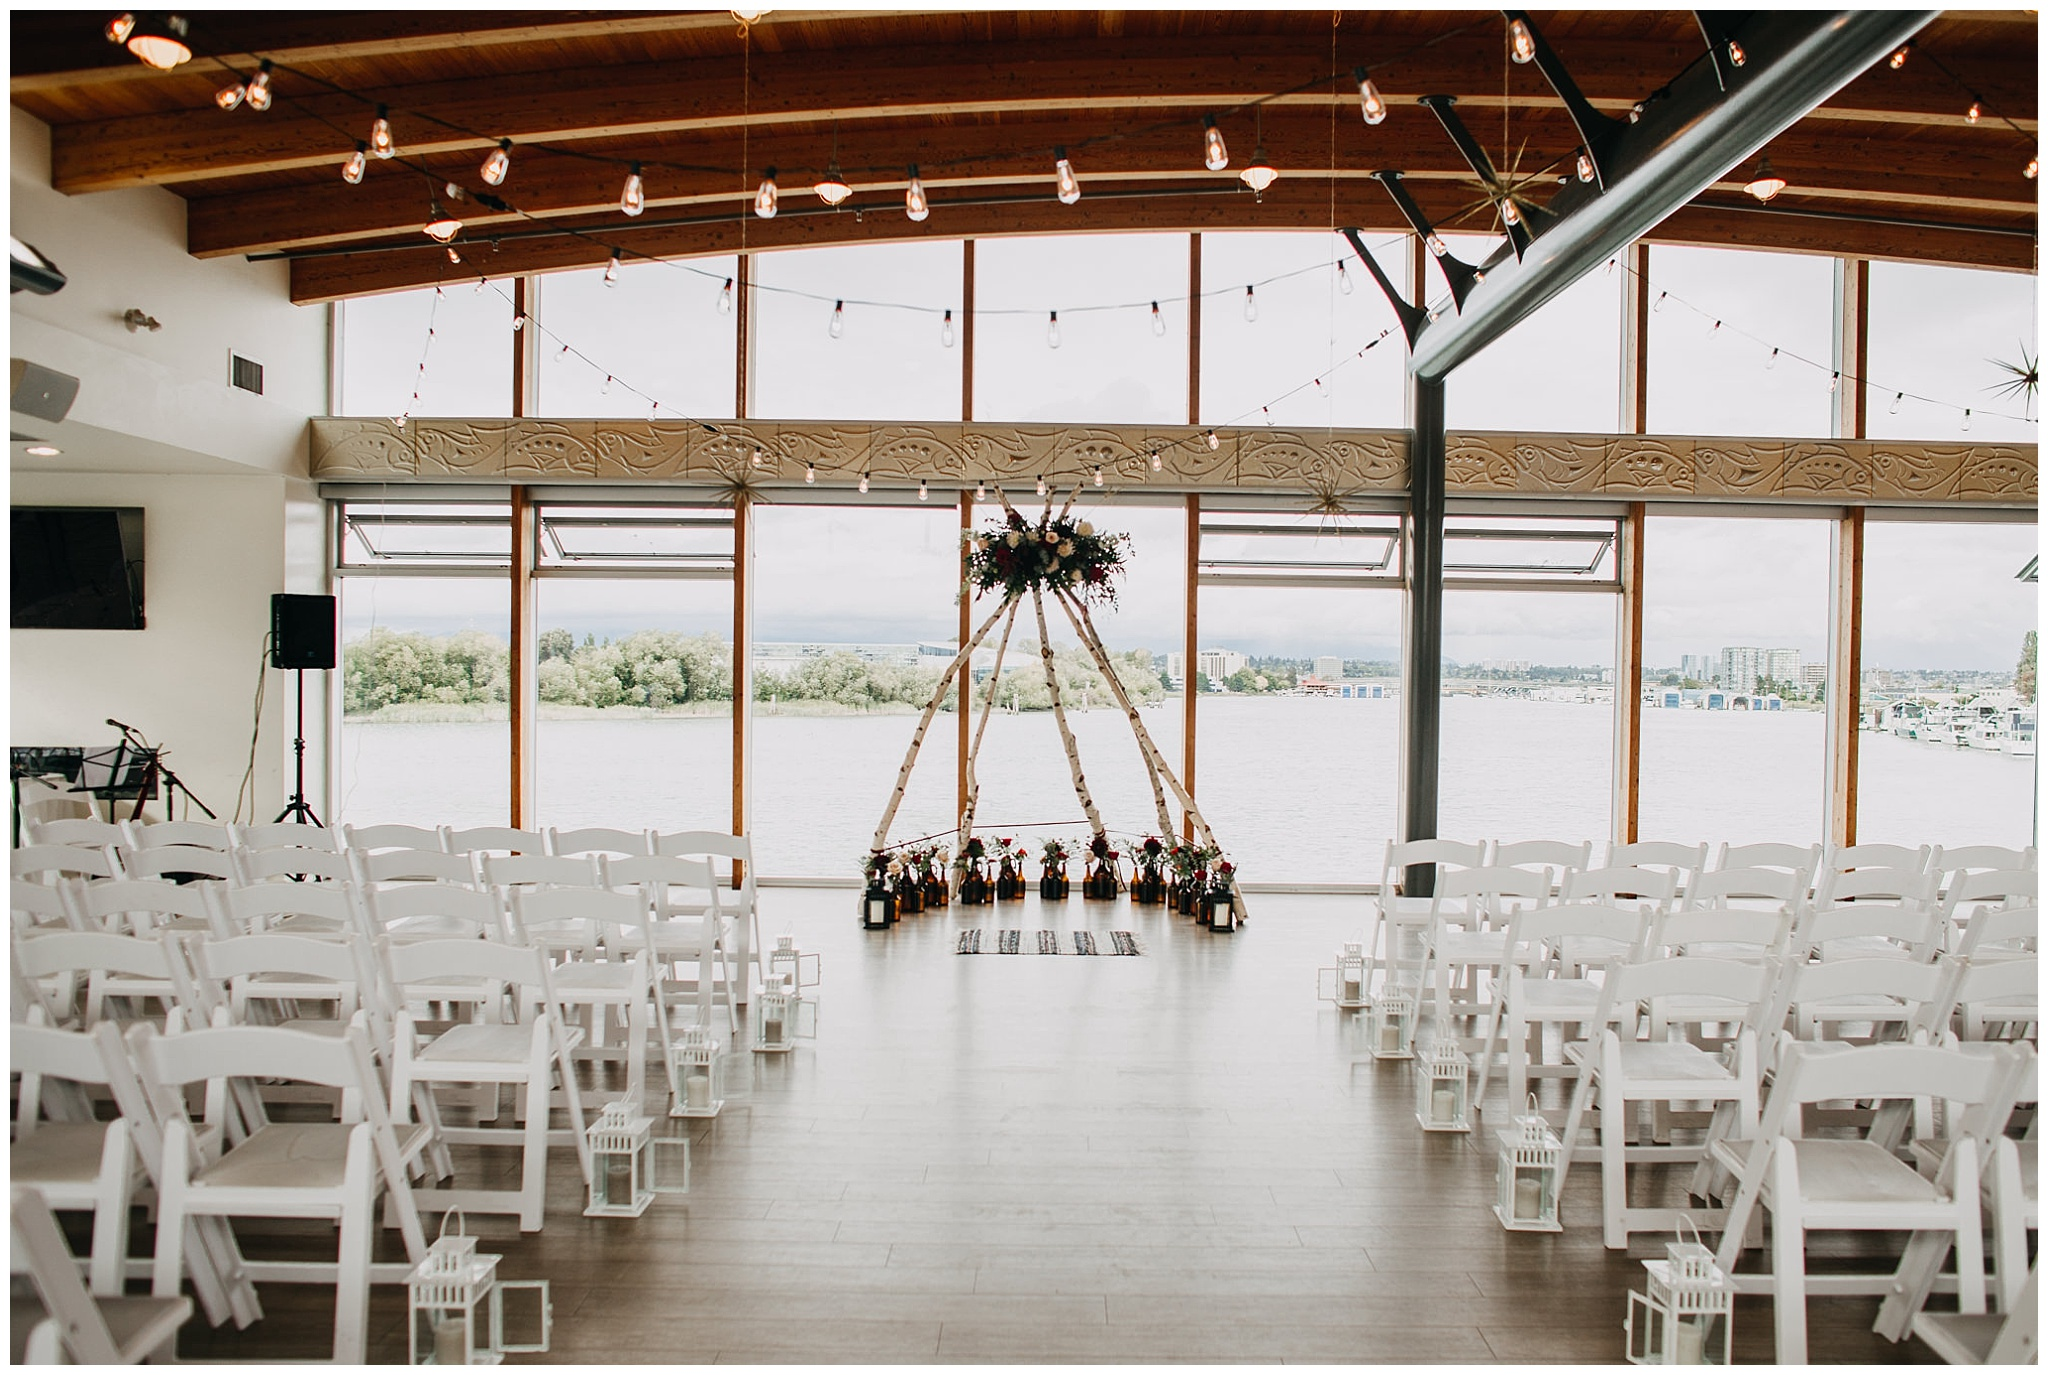 ubc boathouse wedding ceremony arch decor